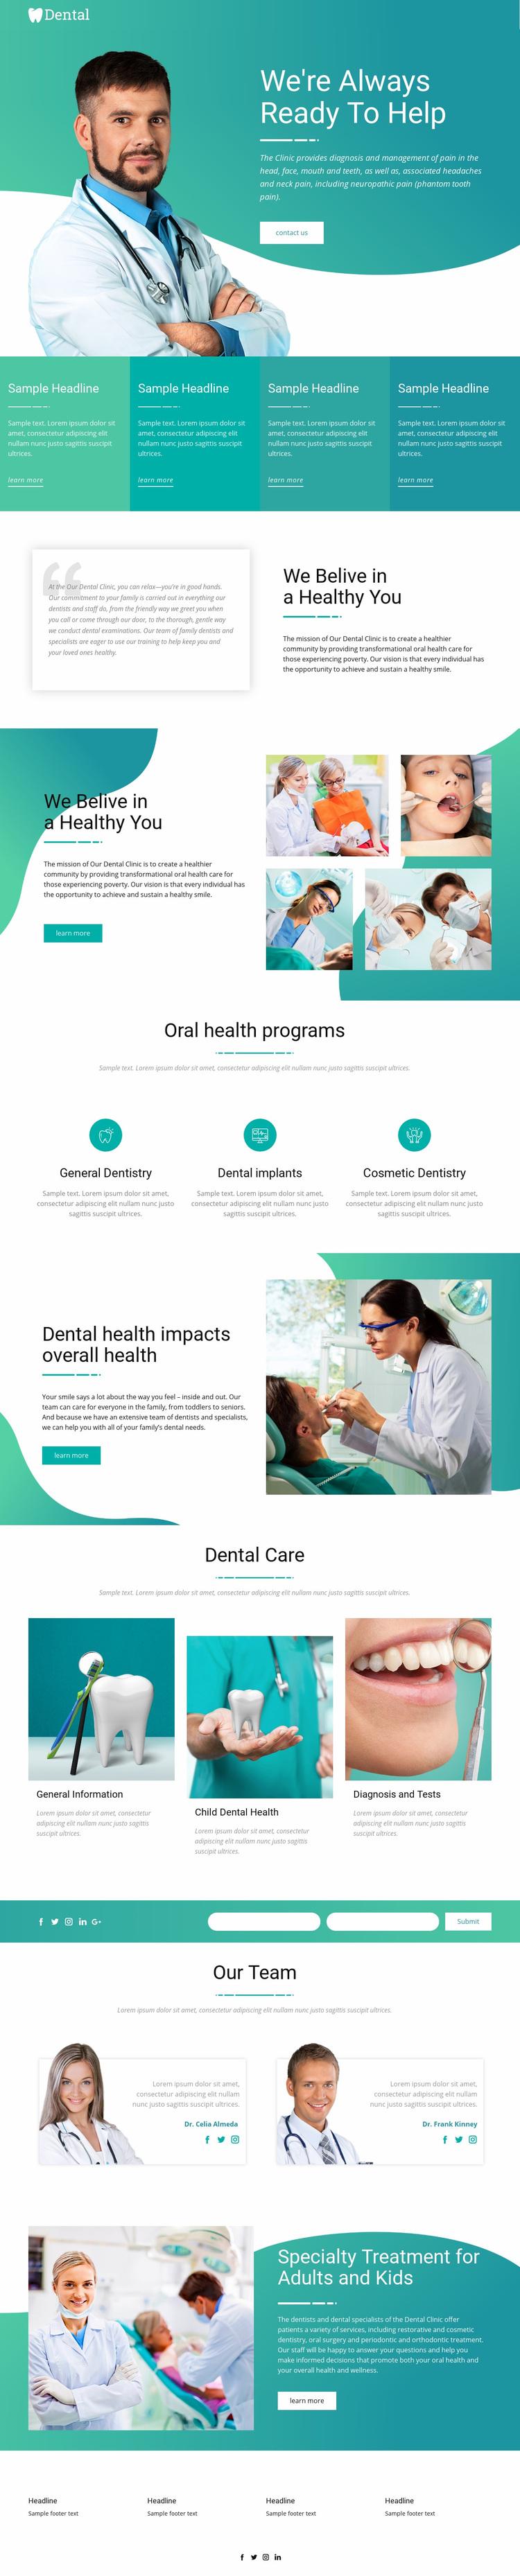 Serving and helping medicine Web Page Designer